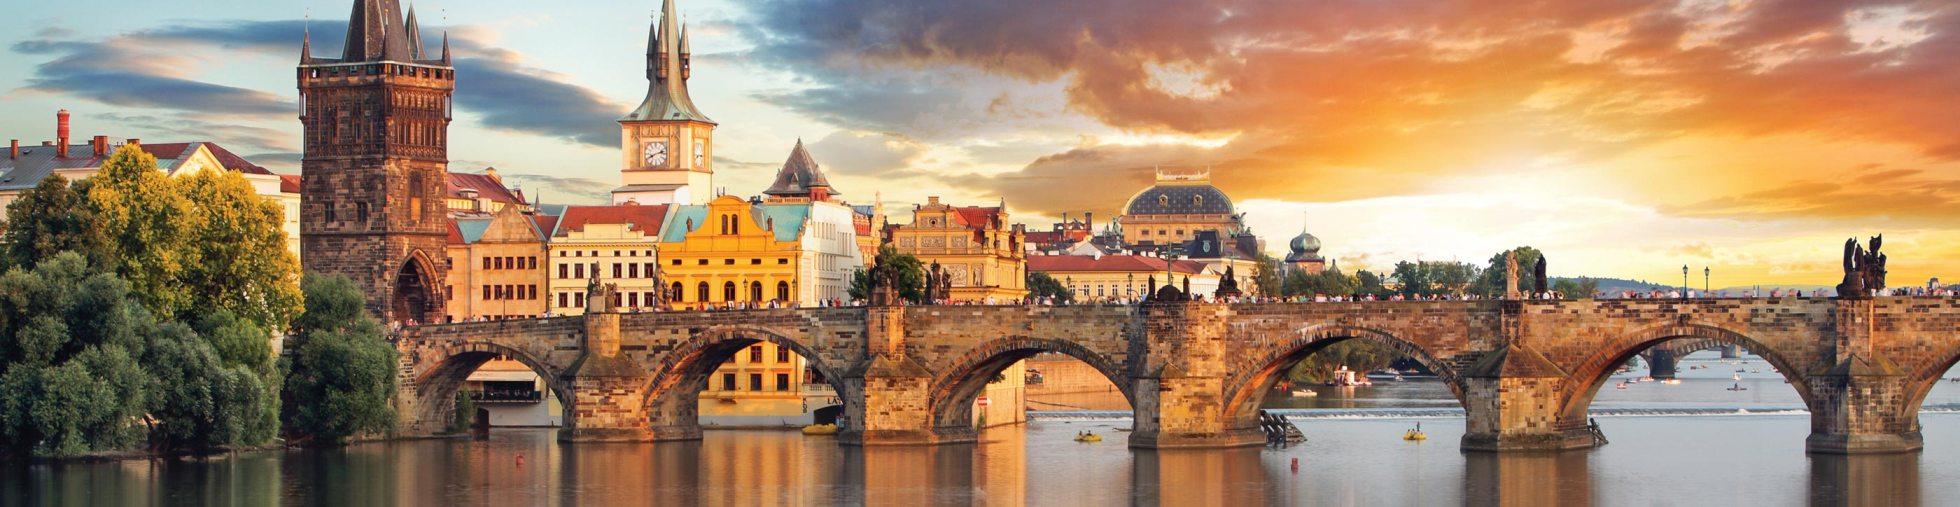 PRAG NOVA GODINA 2018